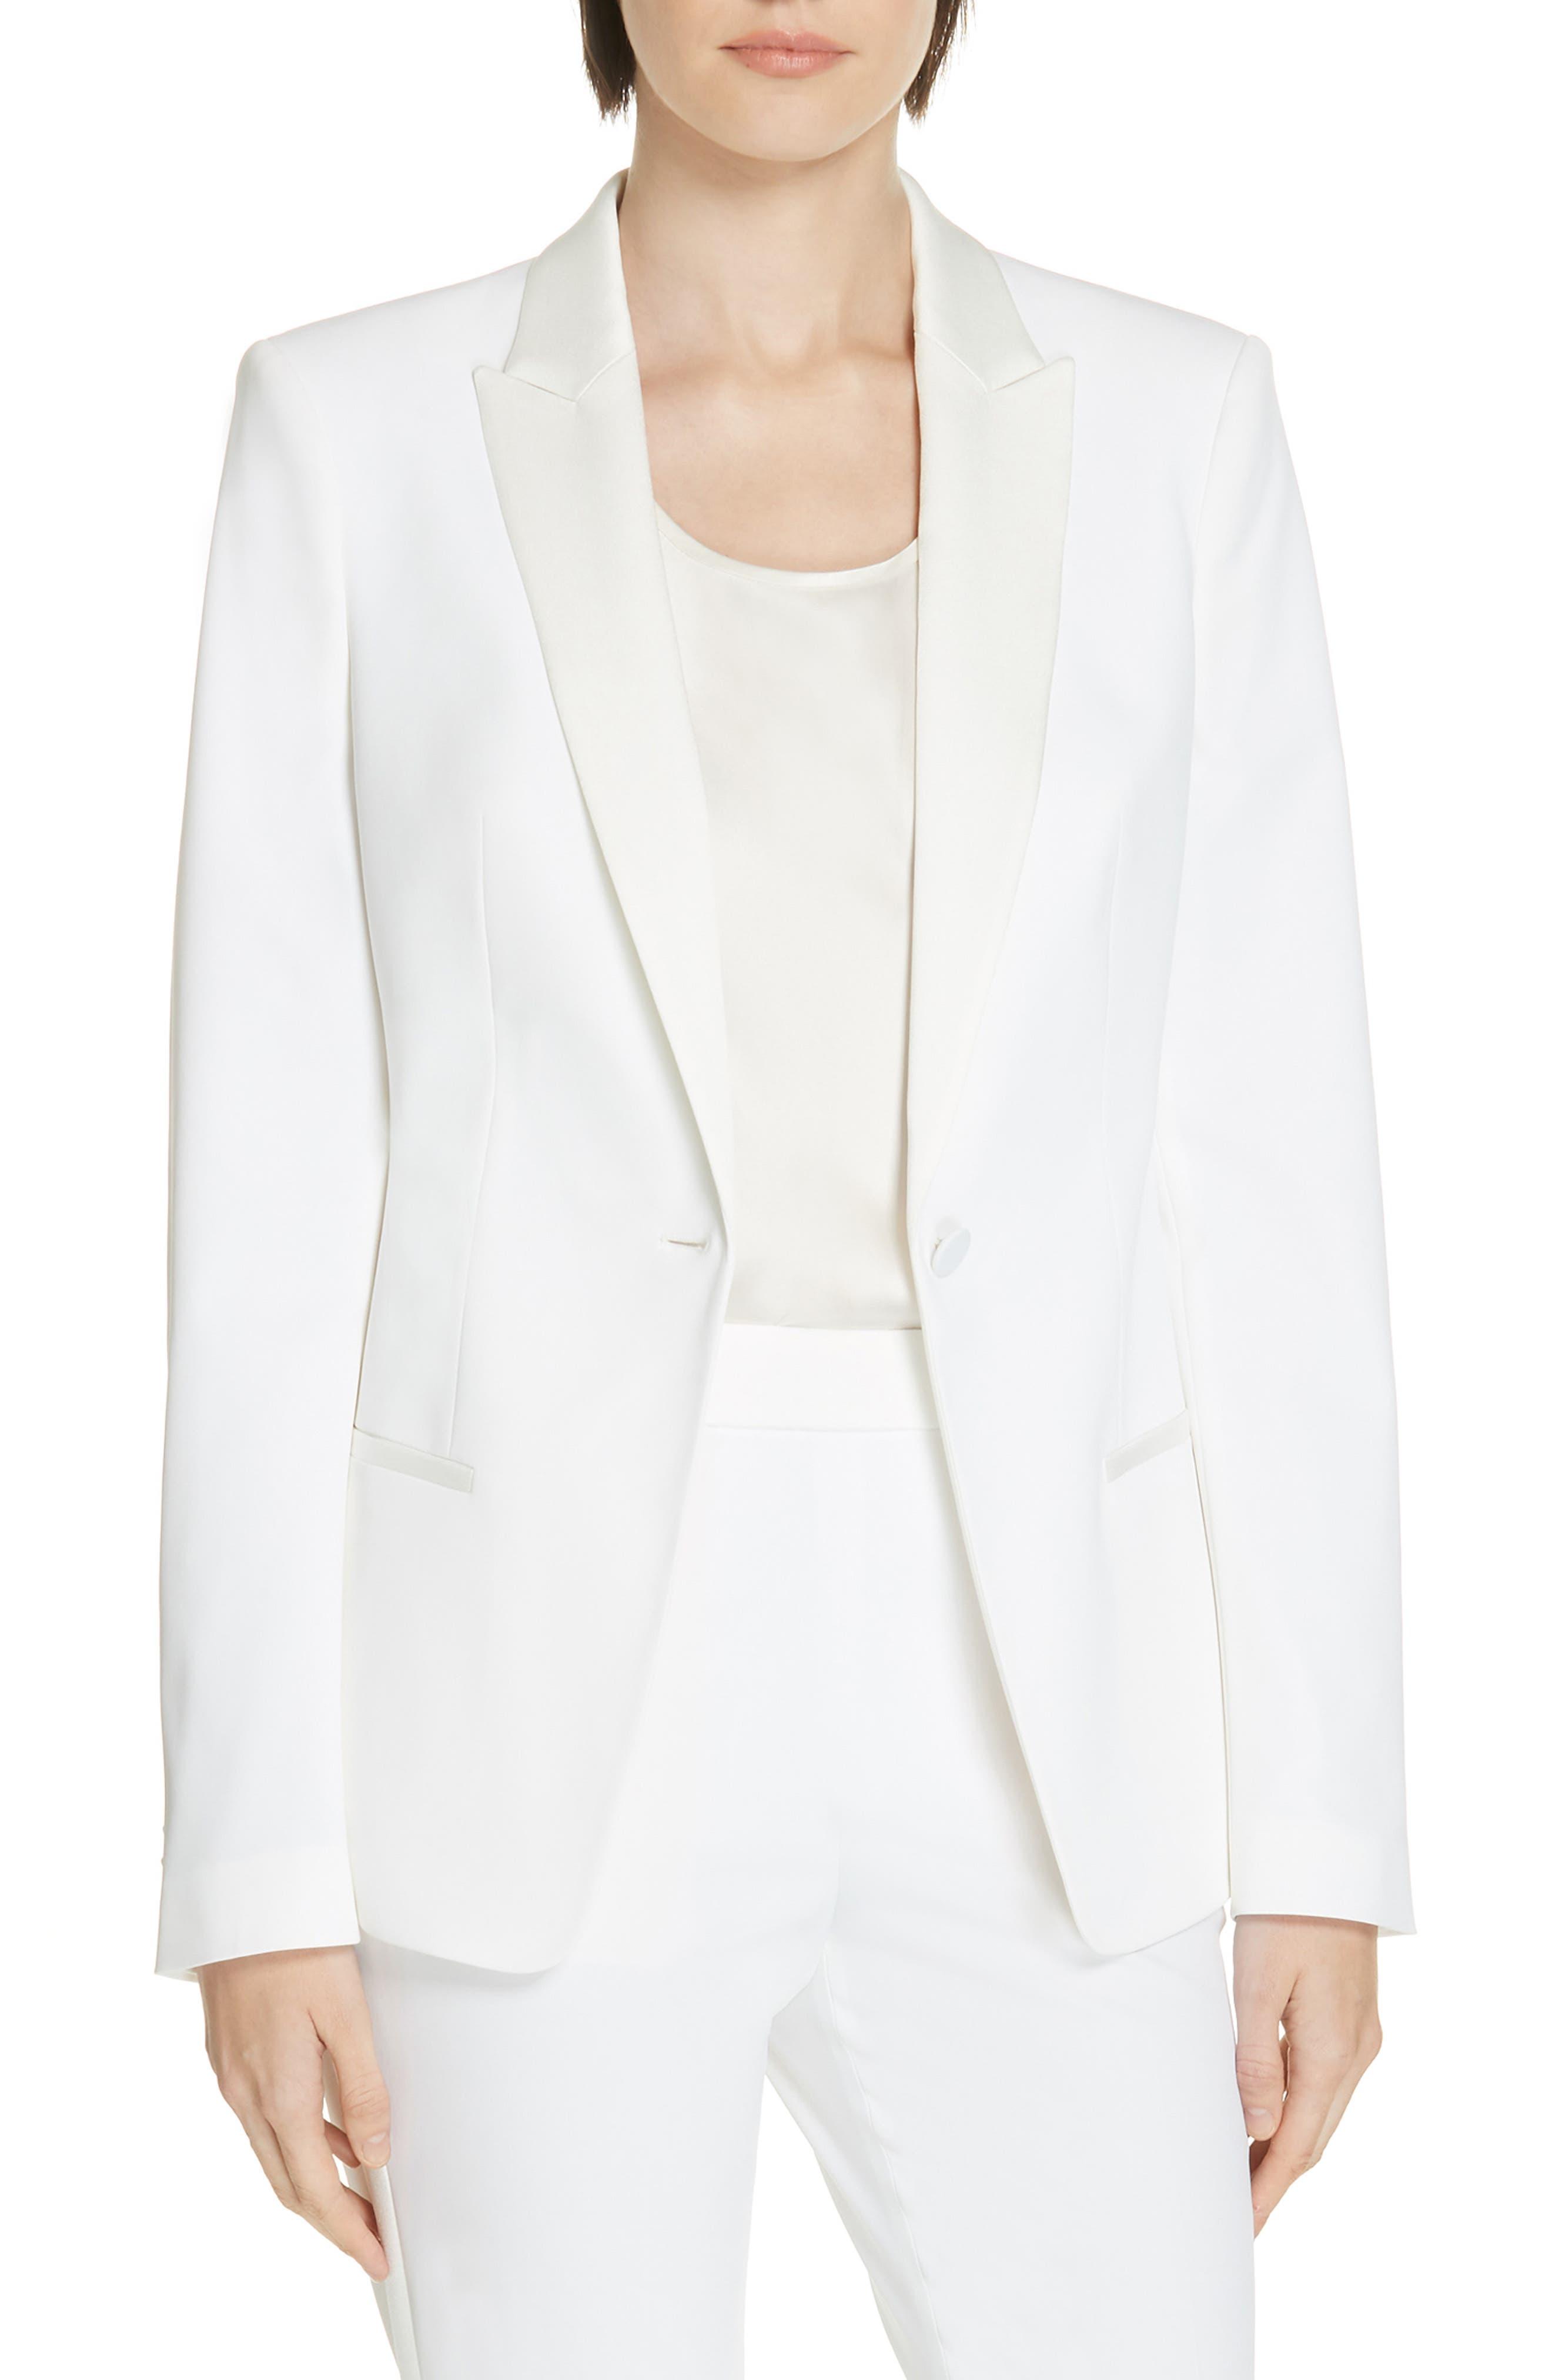 BOSS Jaxtiny Tux Stretch Jacket in Vanilla Light